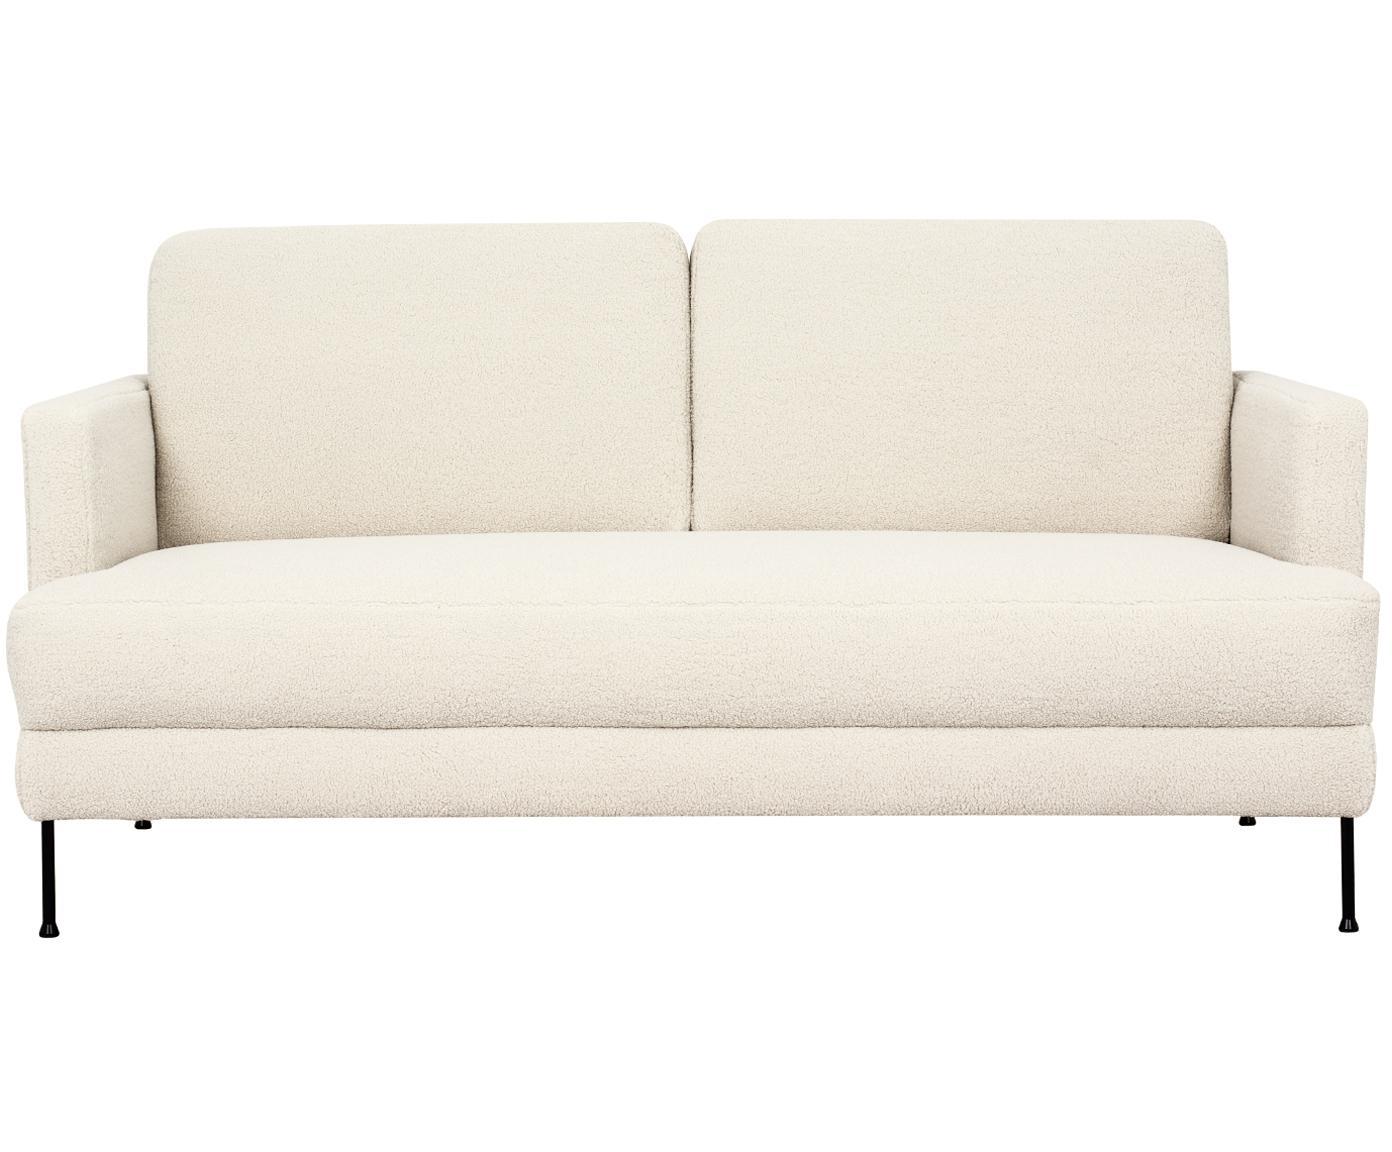 Teddy-Sofa Fluente (2-Sitzer), Bezug: Polyester (Teddyfell) 40., Gestell: Massives Kiefernholz, Füße: Metall, lackiert, Teddy Cremeweiß, 168 x 85 cm